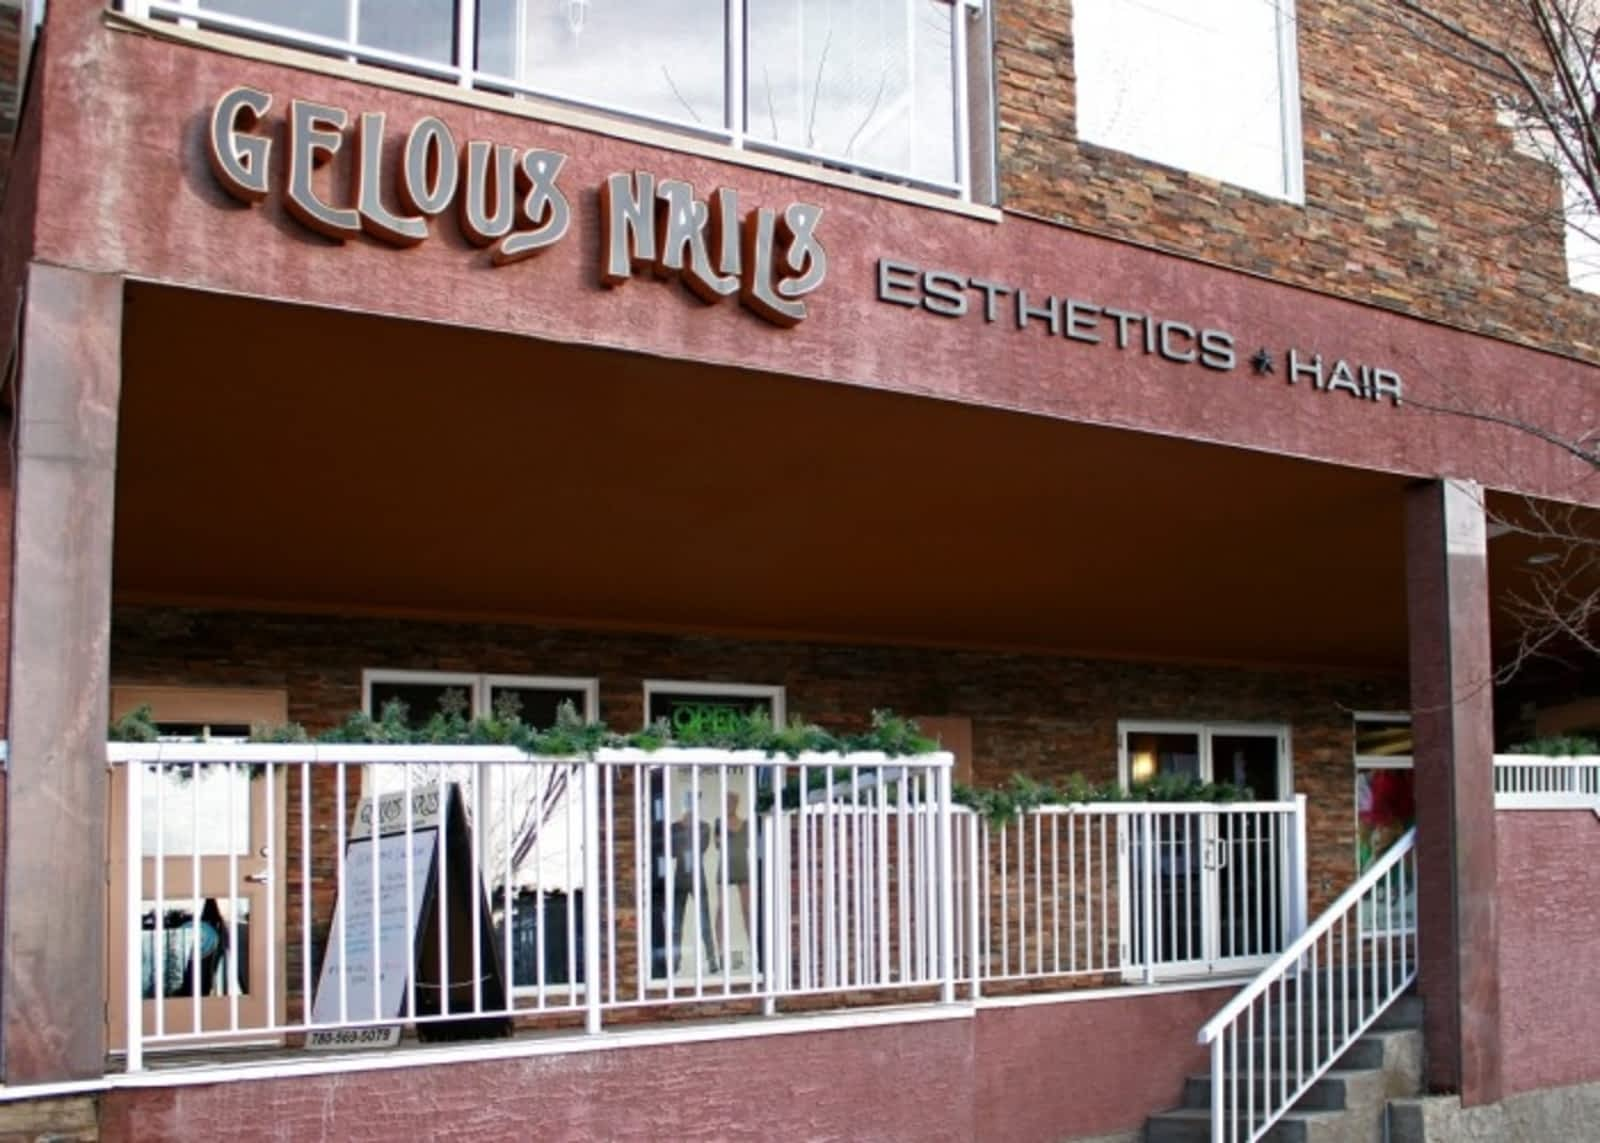 Gelous Nails Estetics Studio - Opening Hours - 102-5 Perron St, St ...